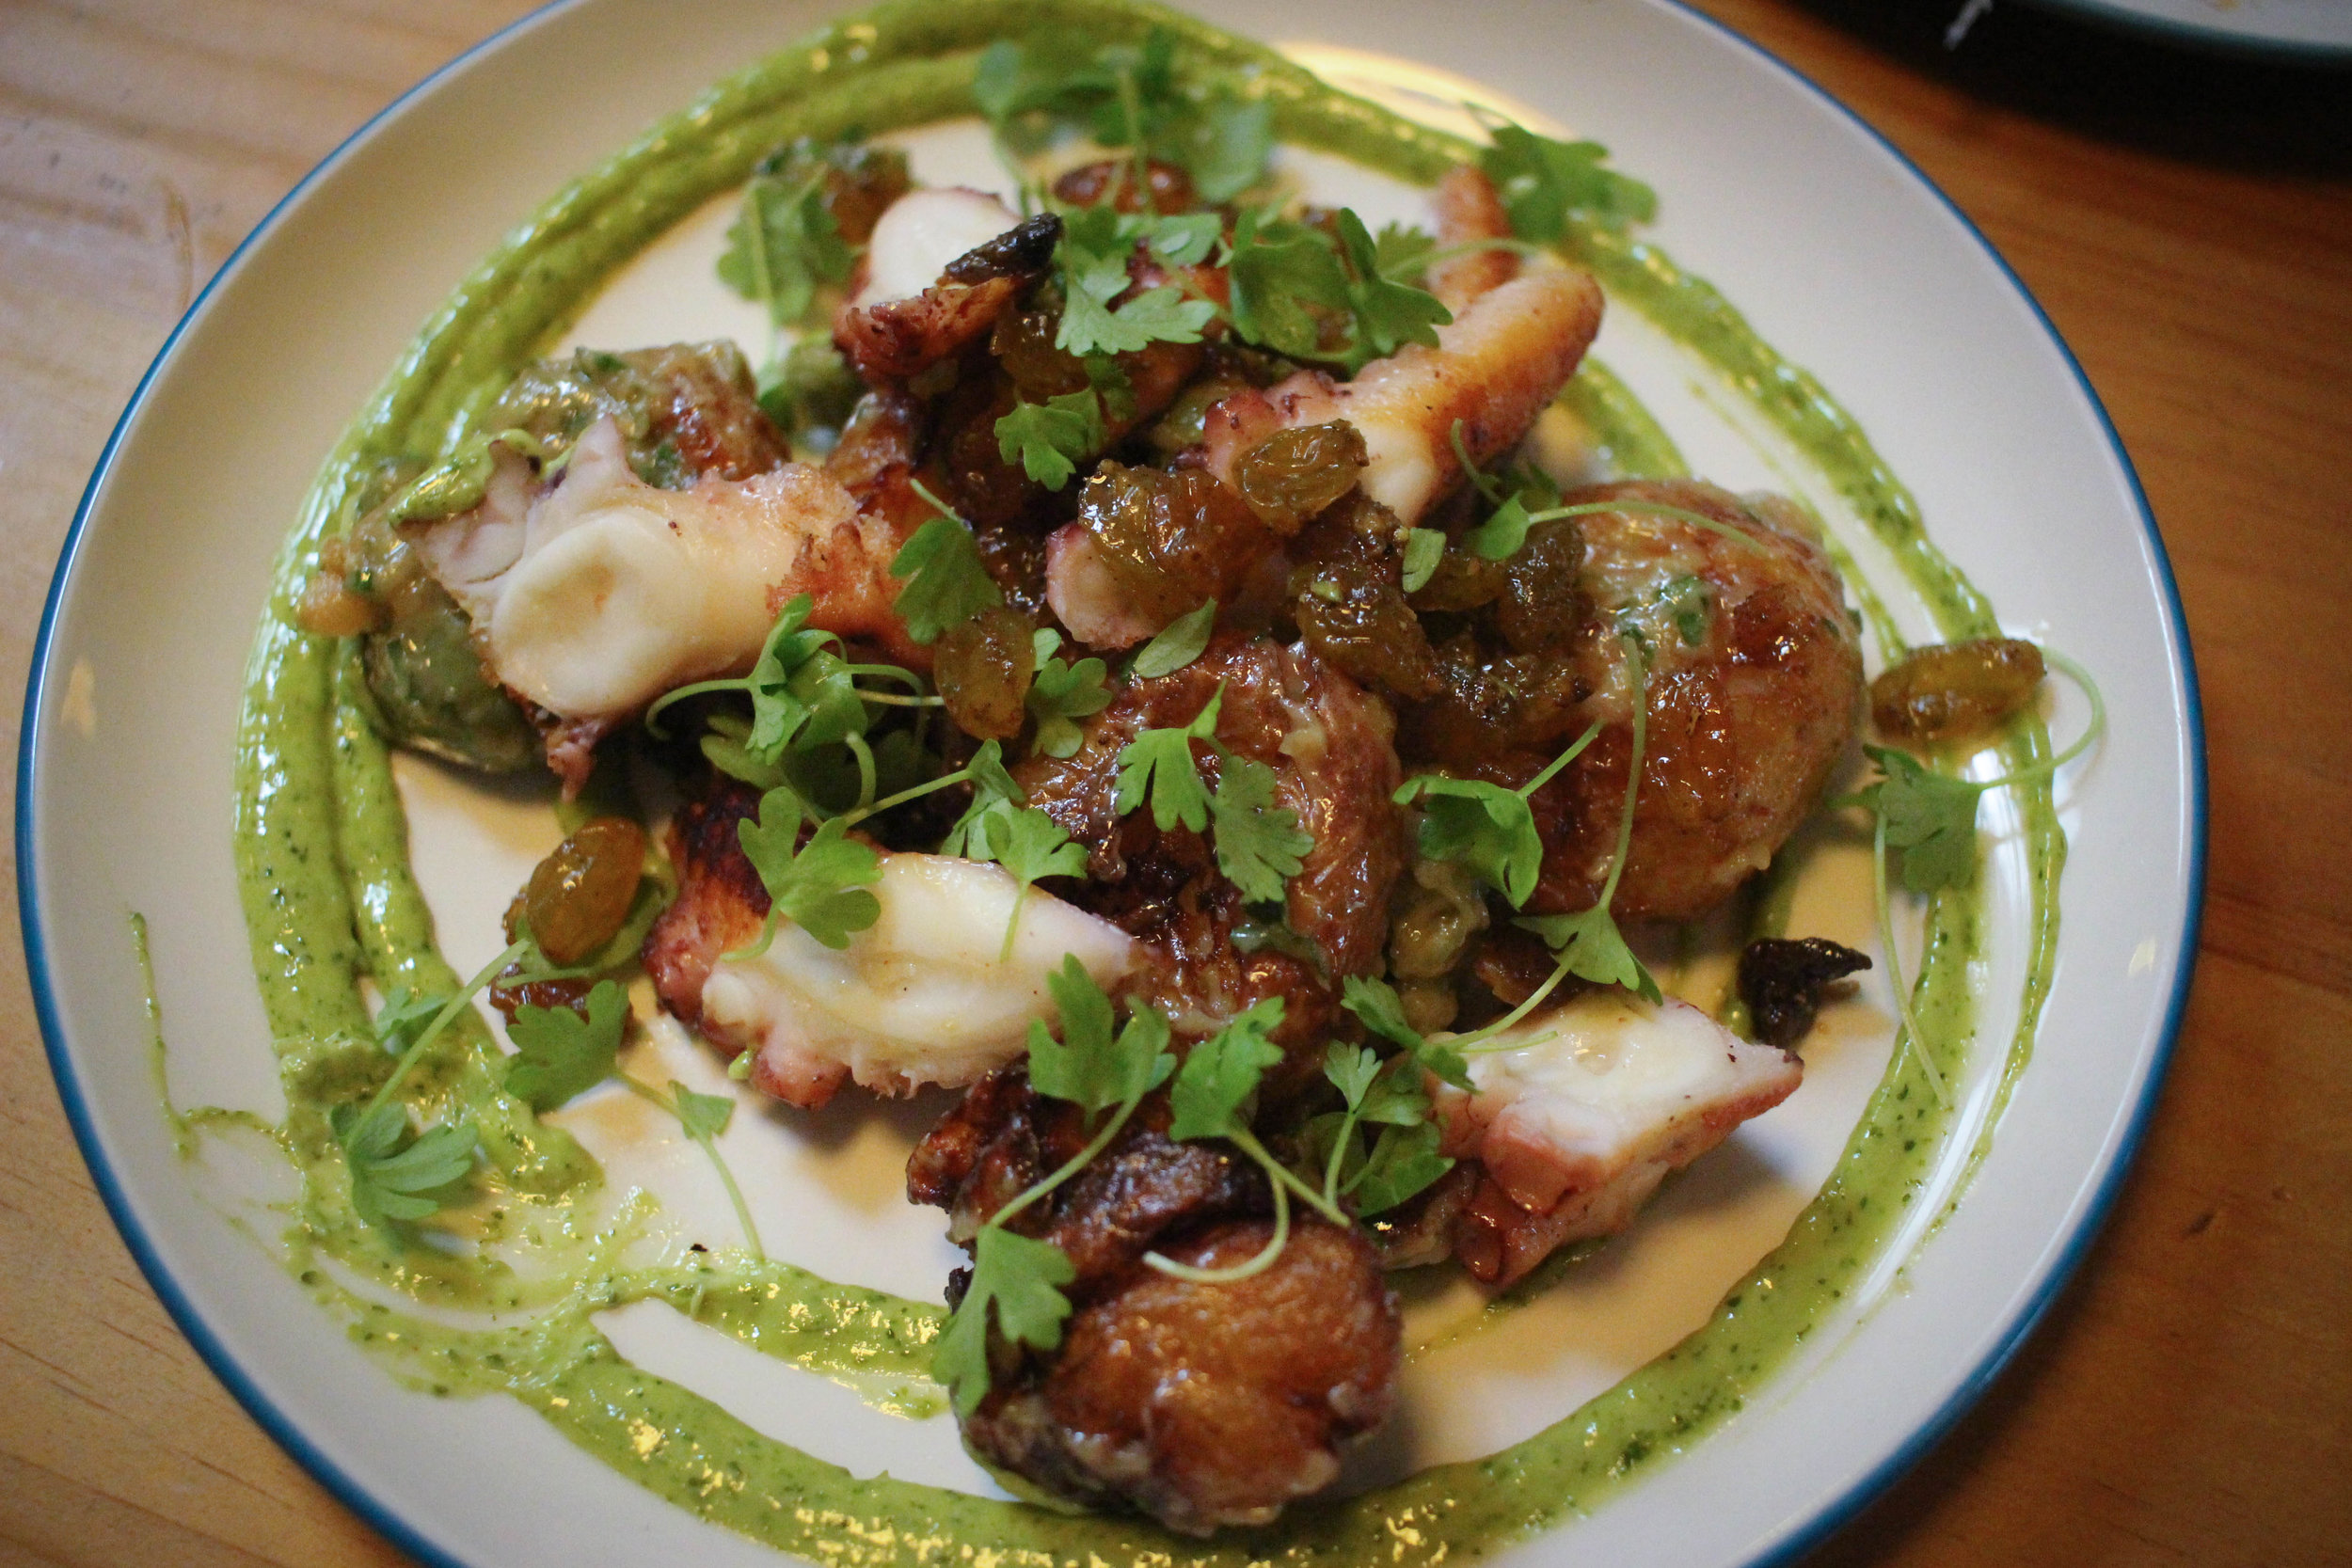 Roasted octopus, curried raisins, castelvetrano, butterball potatoes, fresh coriander